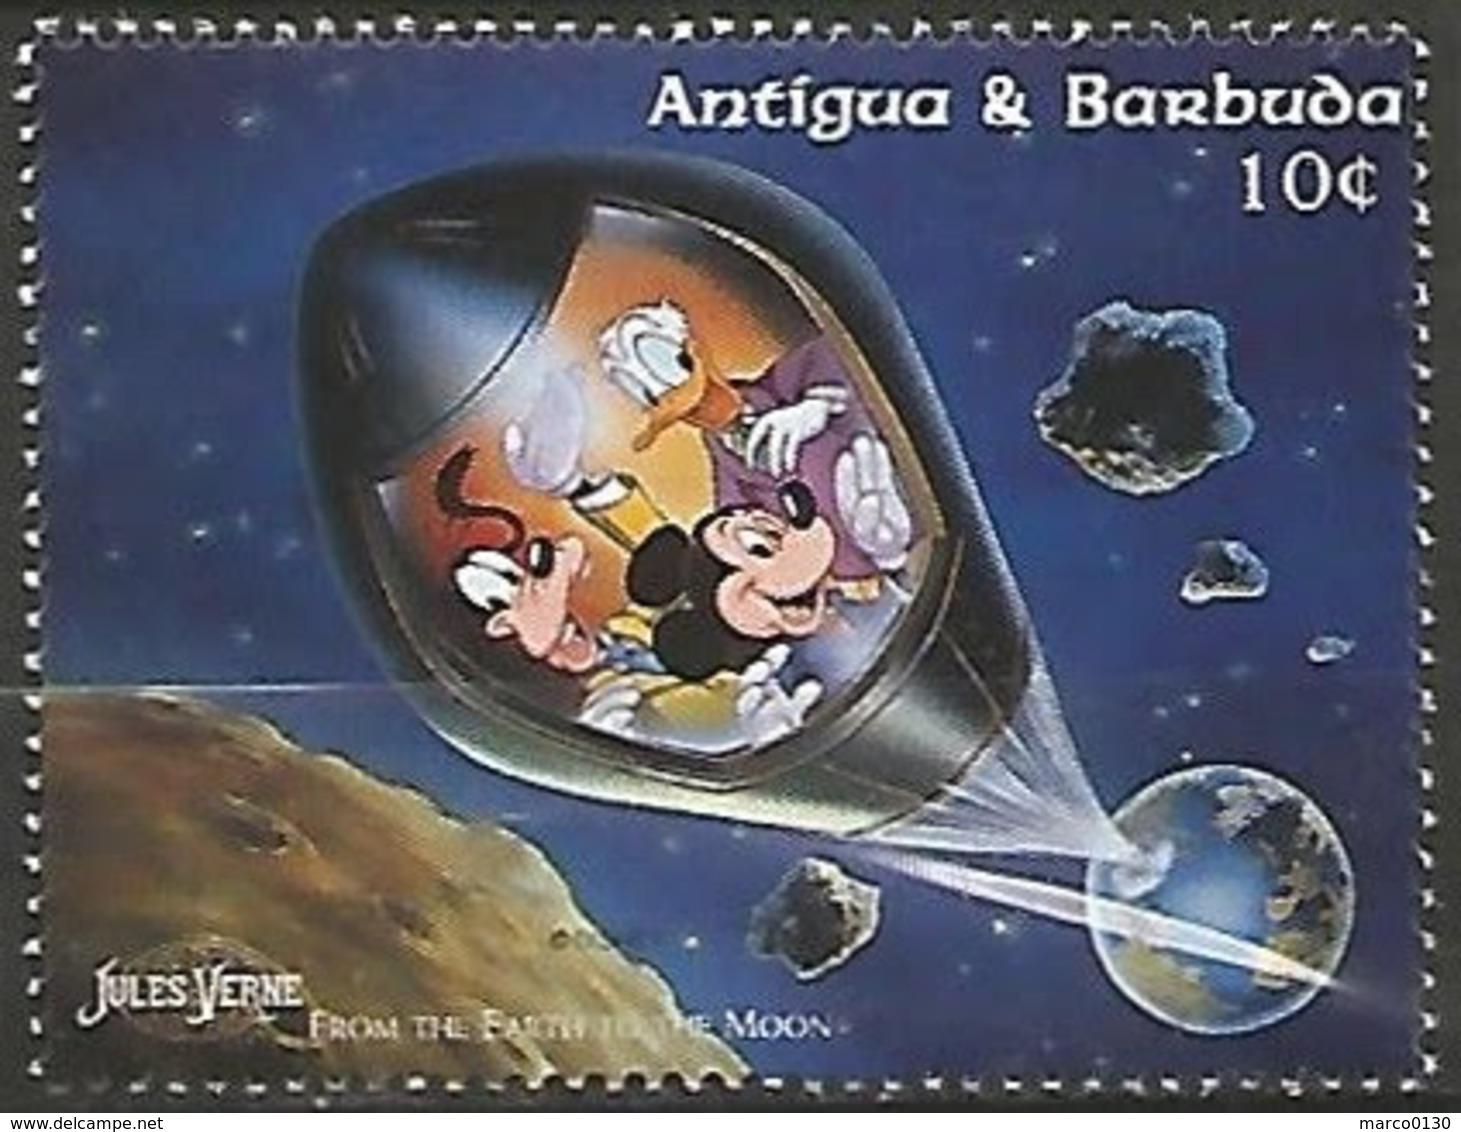 ANTIGUA & BARBUDA N° 2050 NEUF - Antigua E Barbuda (1981-...)